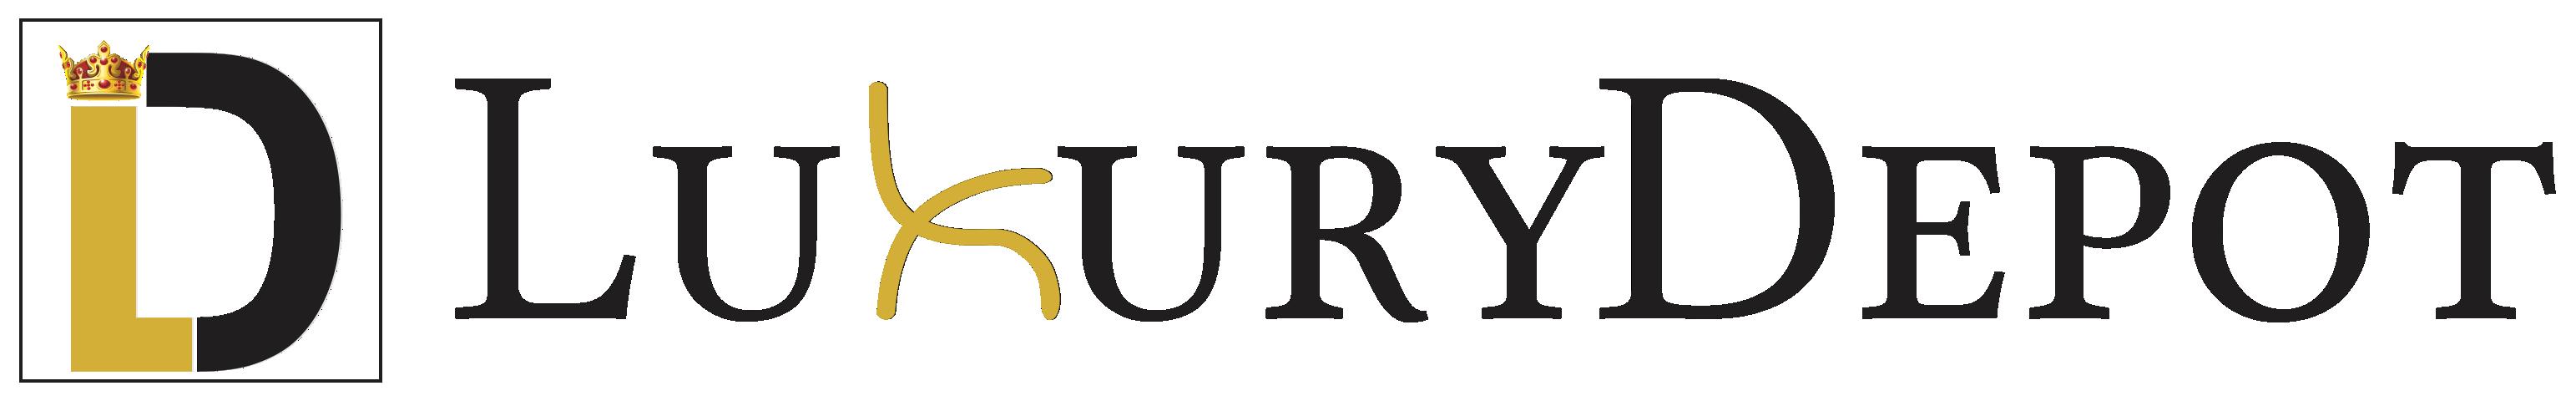 Luxury Depot